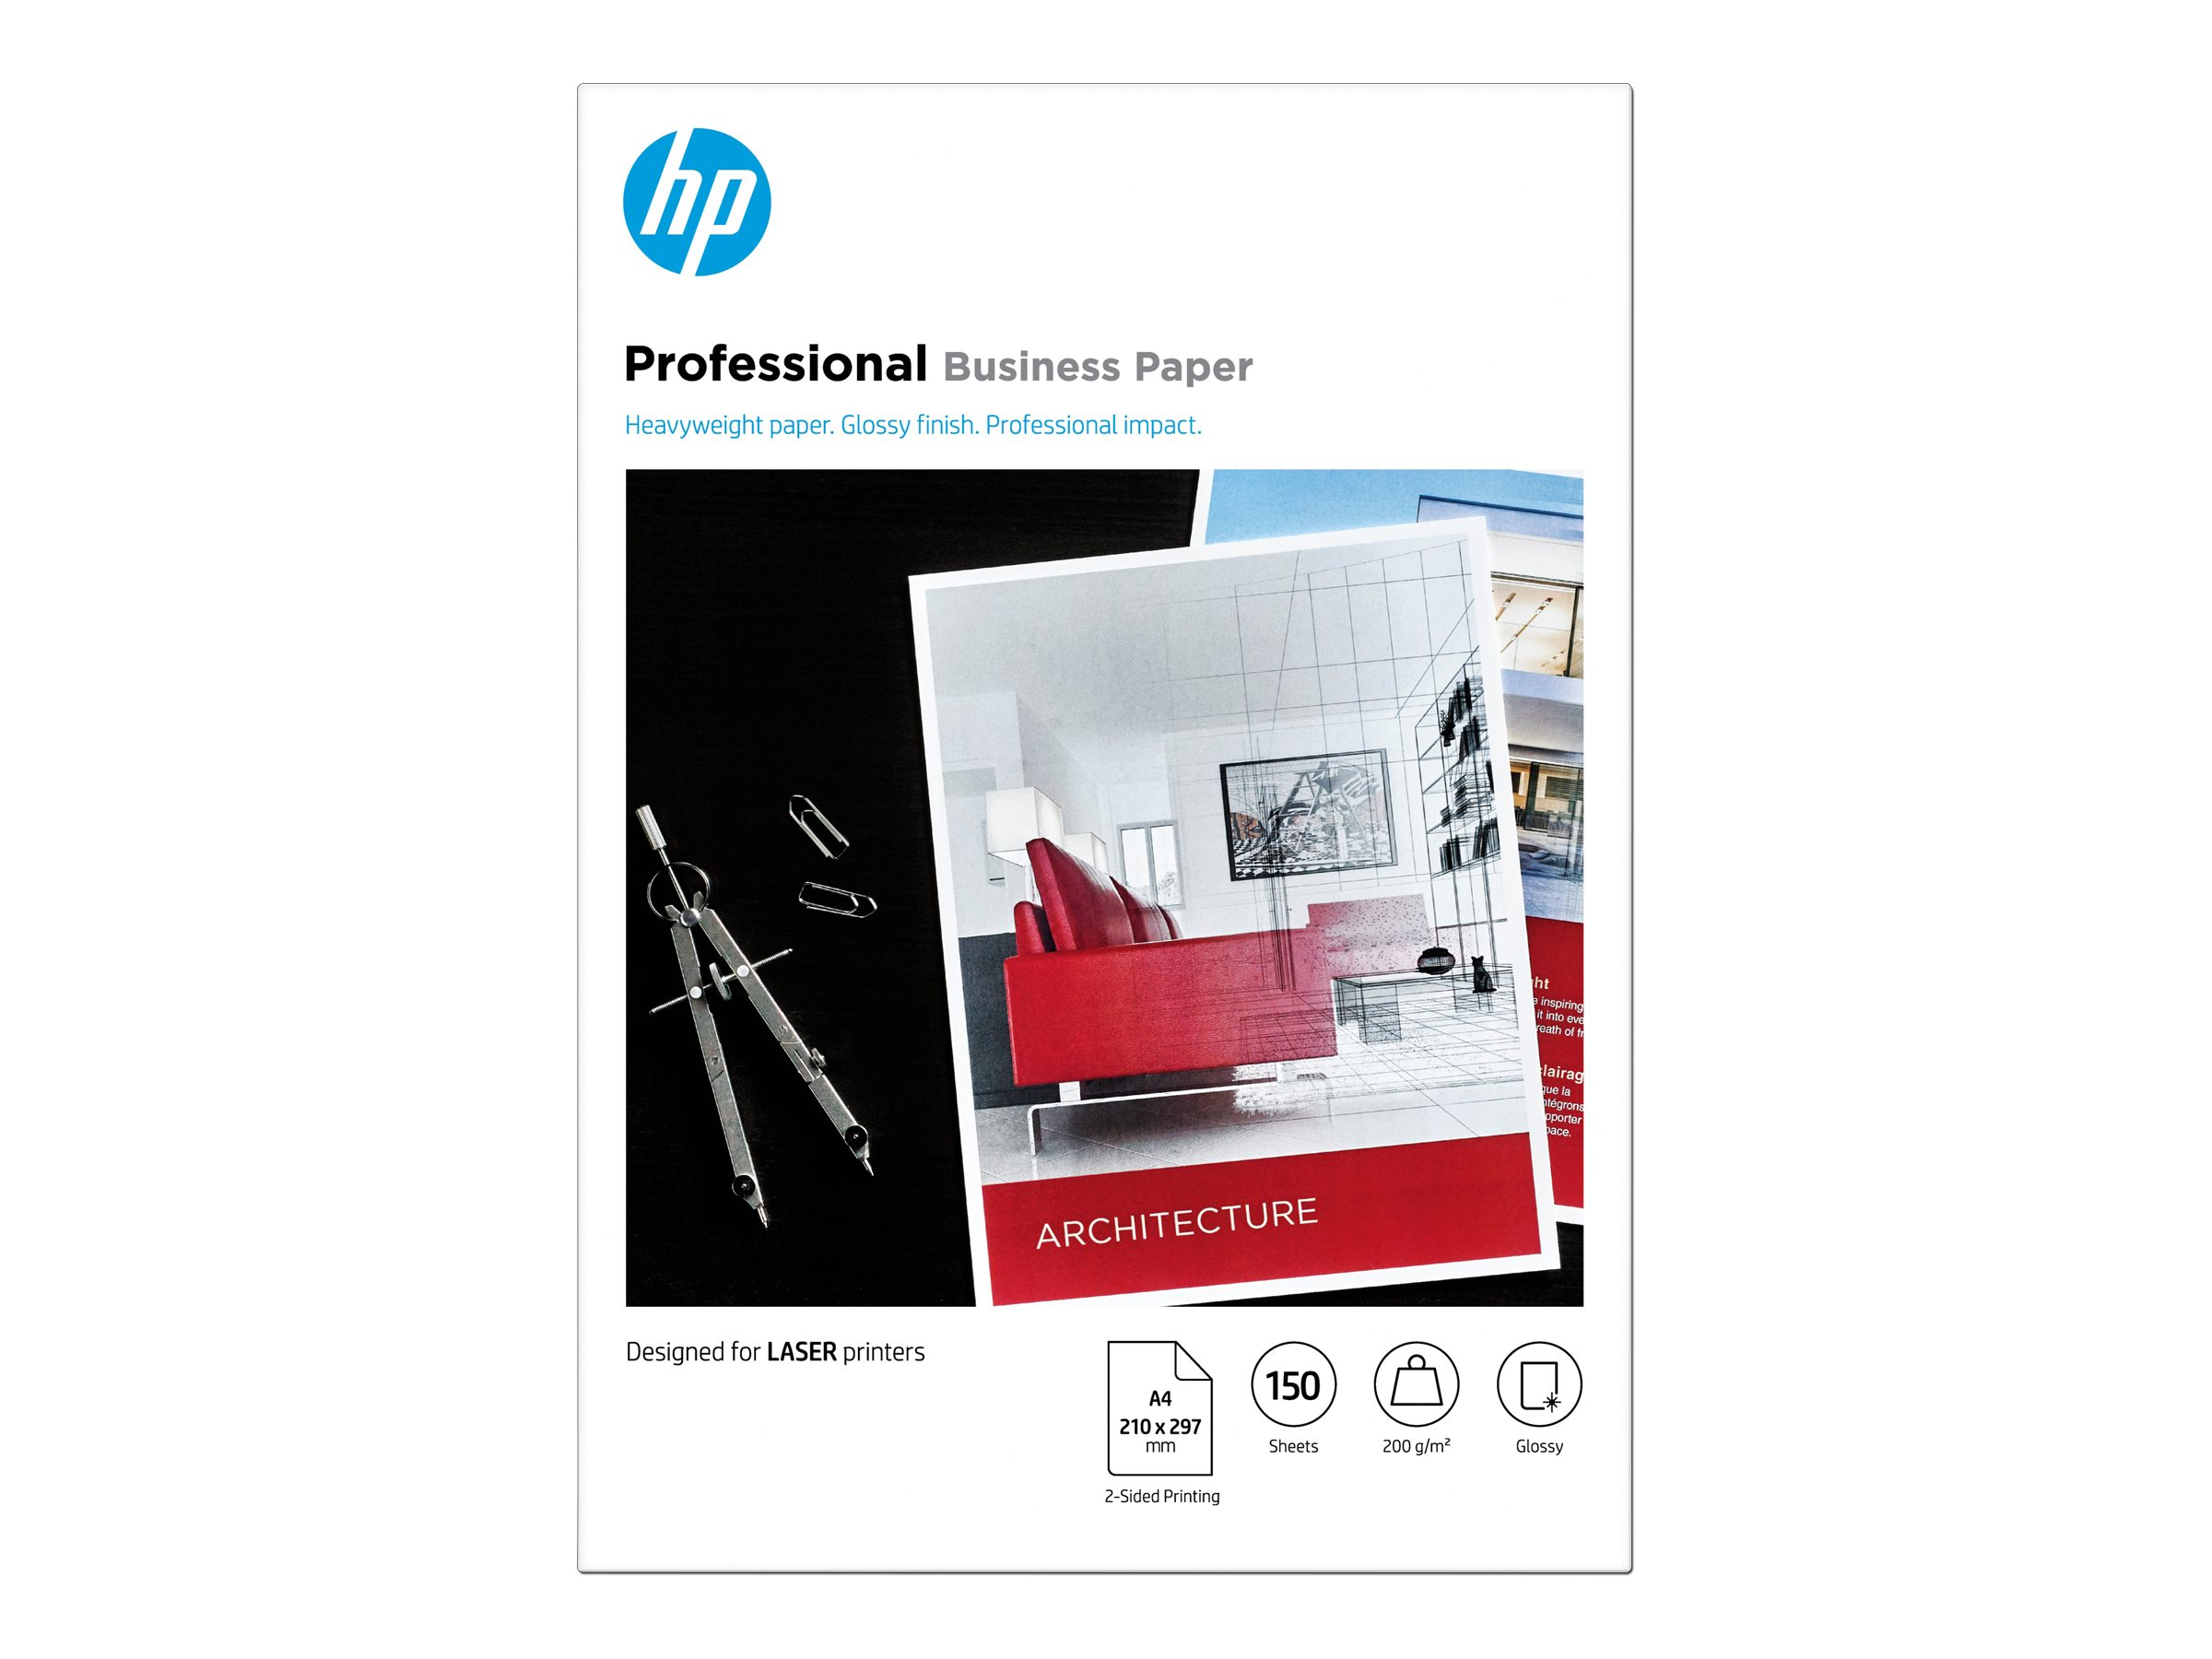 Hp professional glossy paper glaenzend a4 210 x 297 mm 200 g m 150 blatt fotopapier 11992692 7mv83a